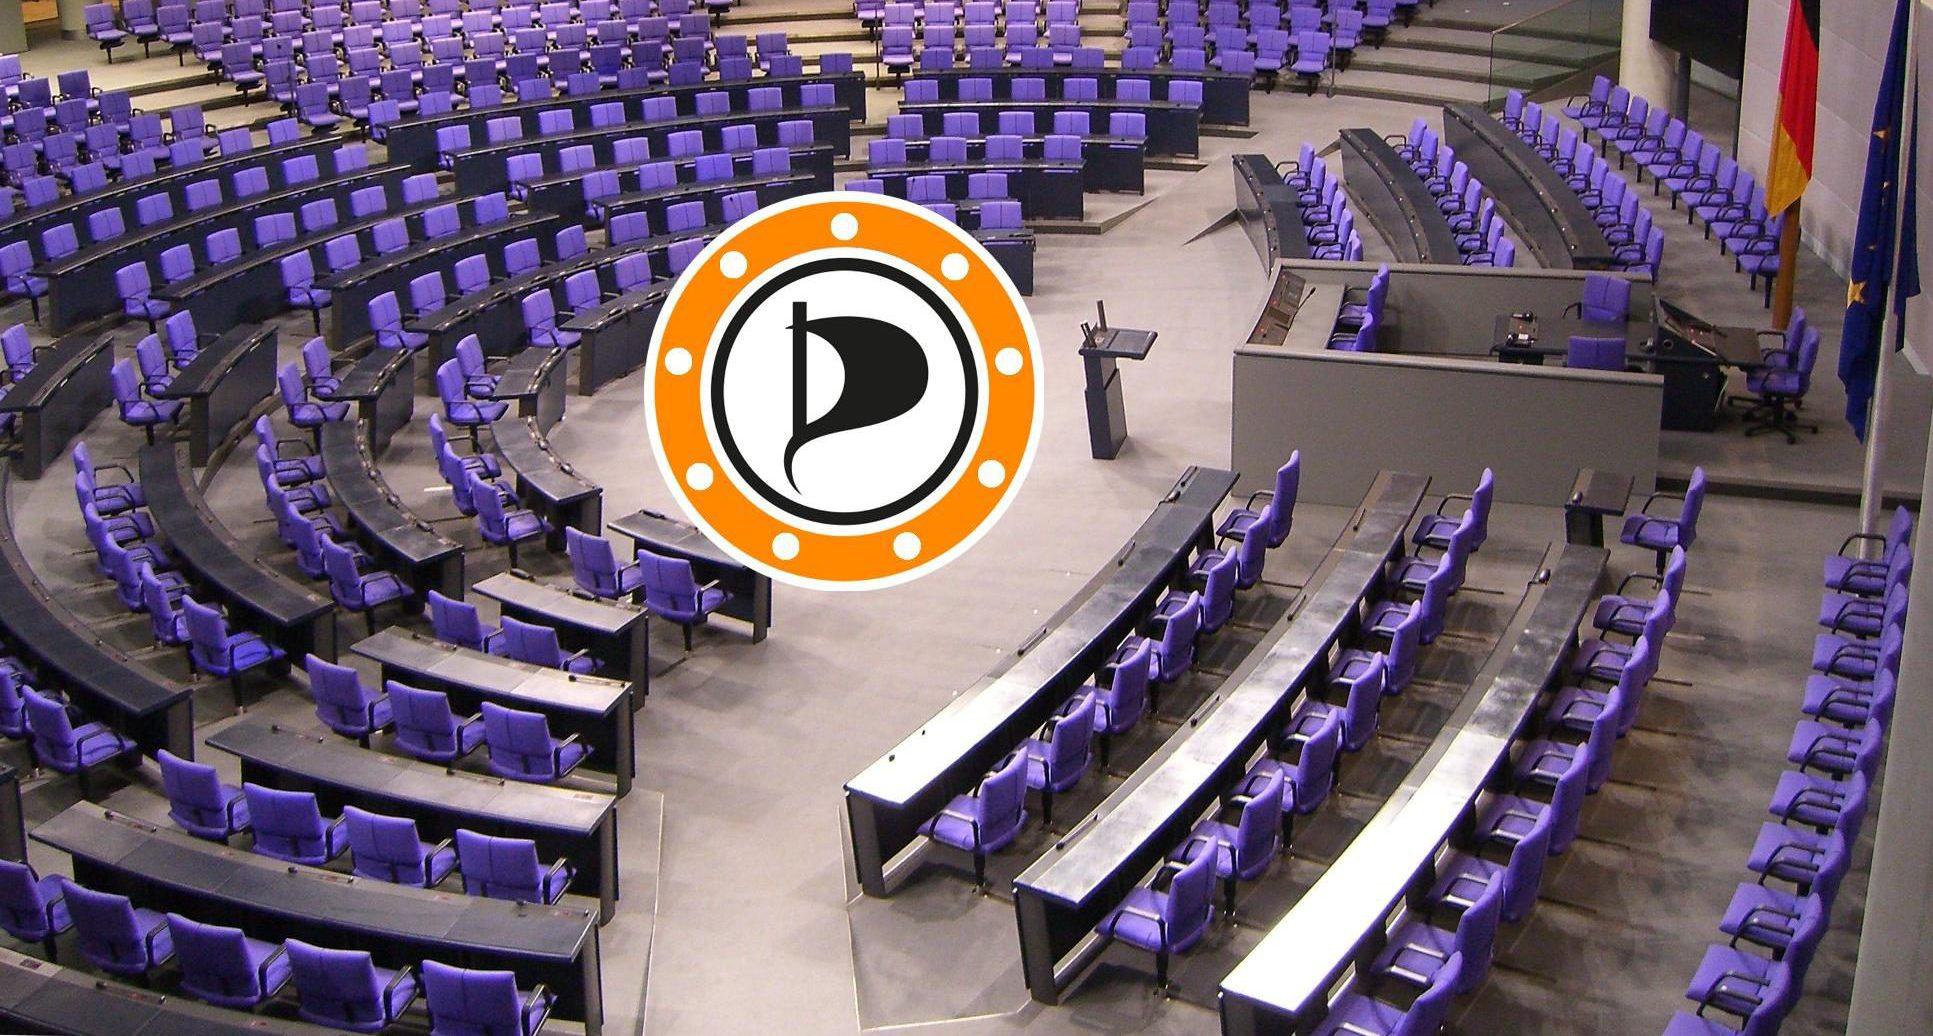 Die Piratenpartei Ennepe-Ruhr will in den Bundestag. Lizenz: CC-BY-SA 3.0 by Times